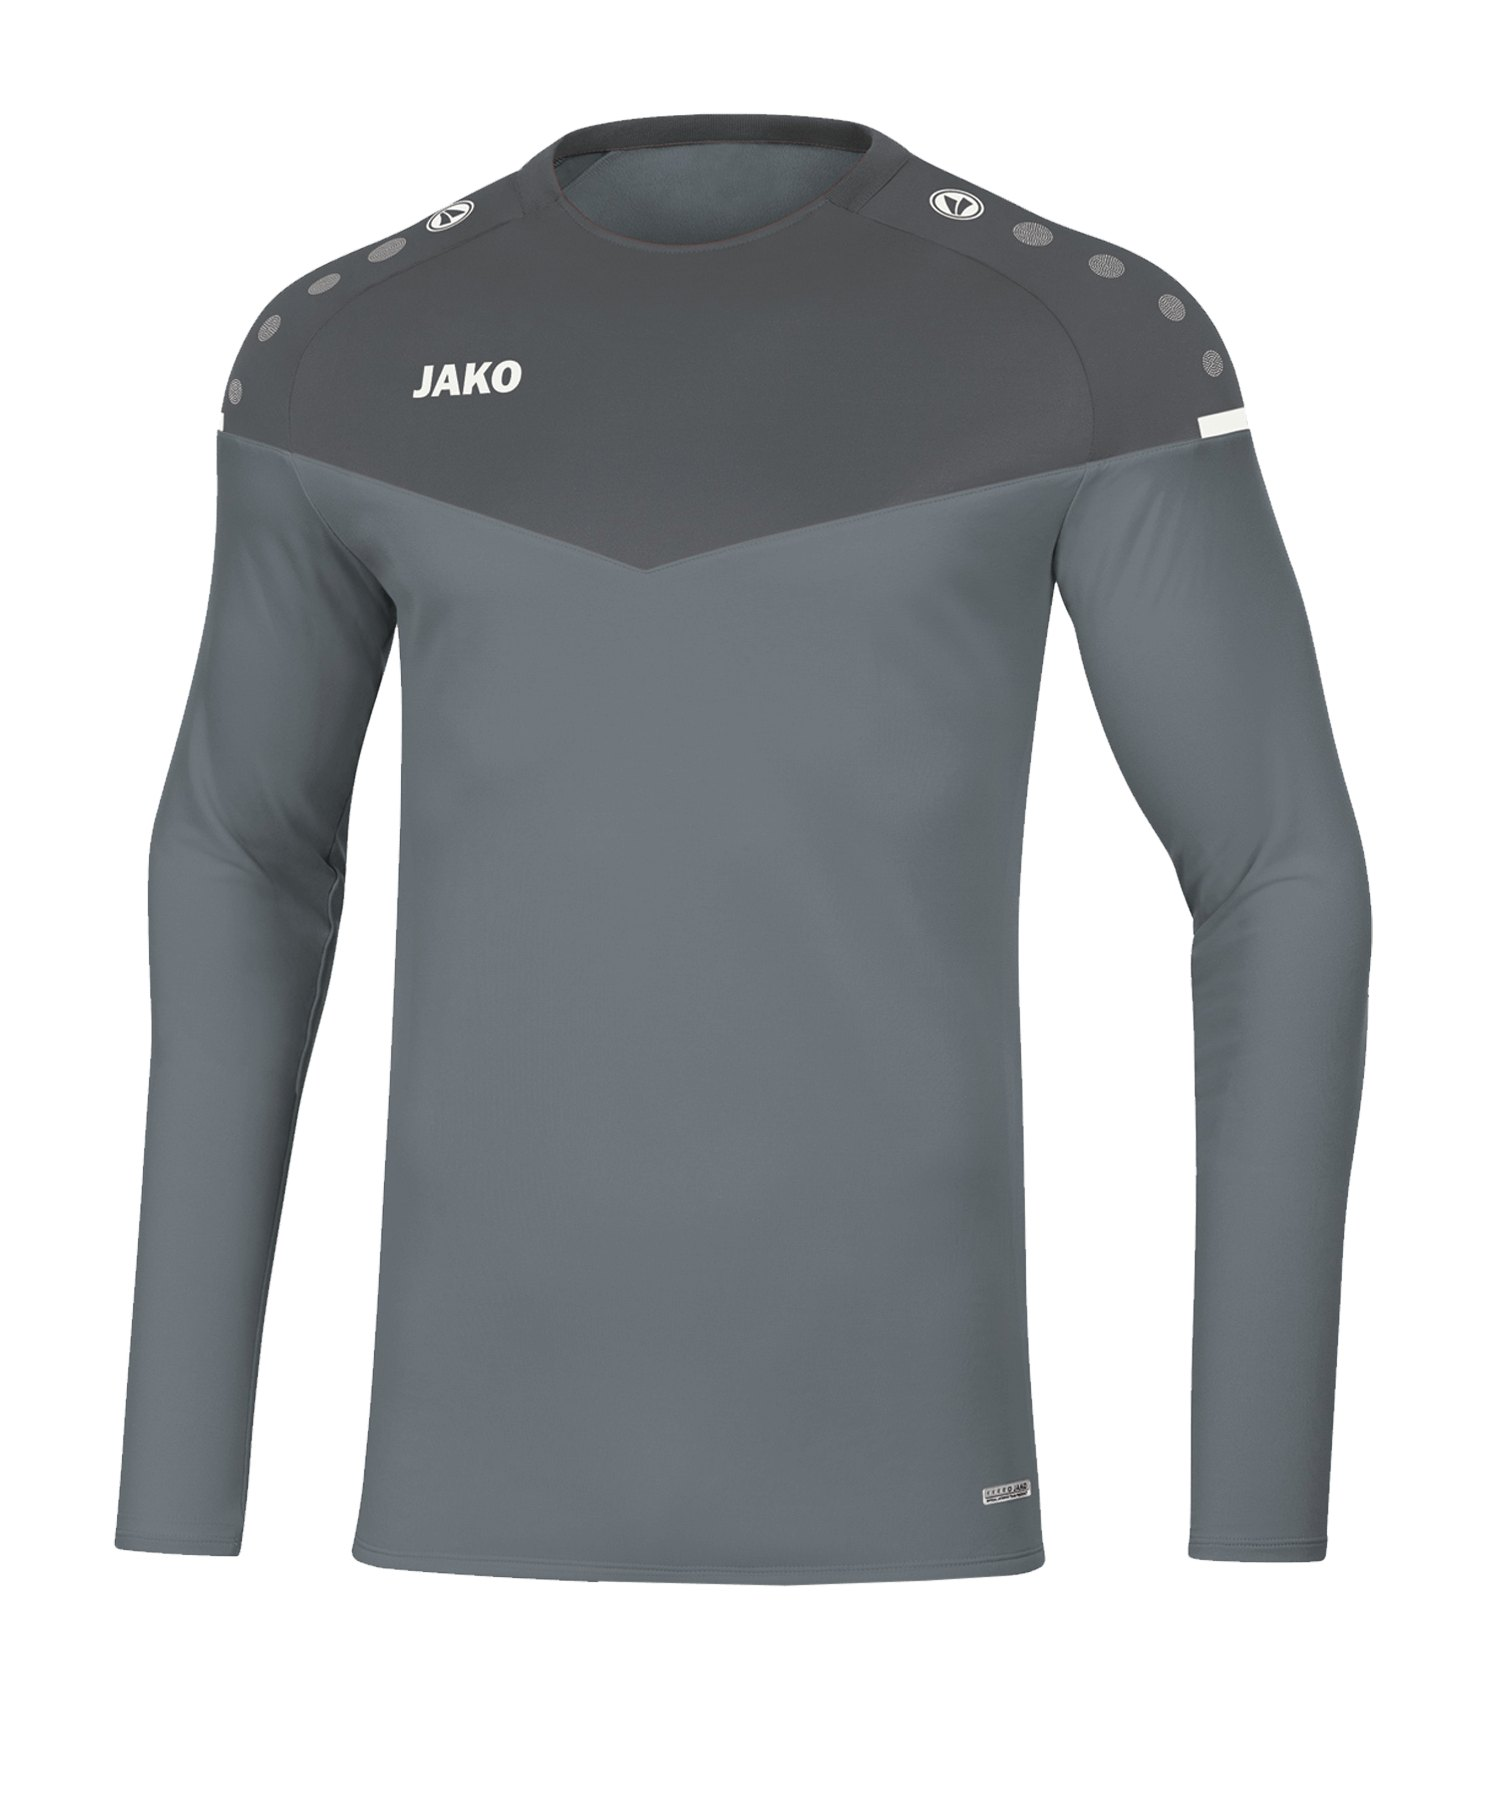 Jako Champ 2.0 Sweatshirt Kids Grau F40 - grau